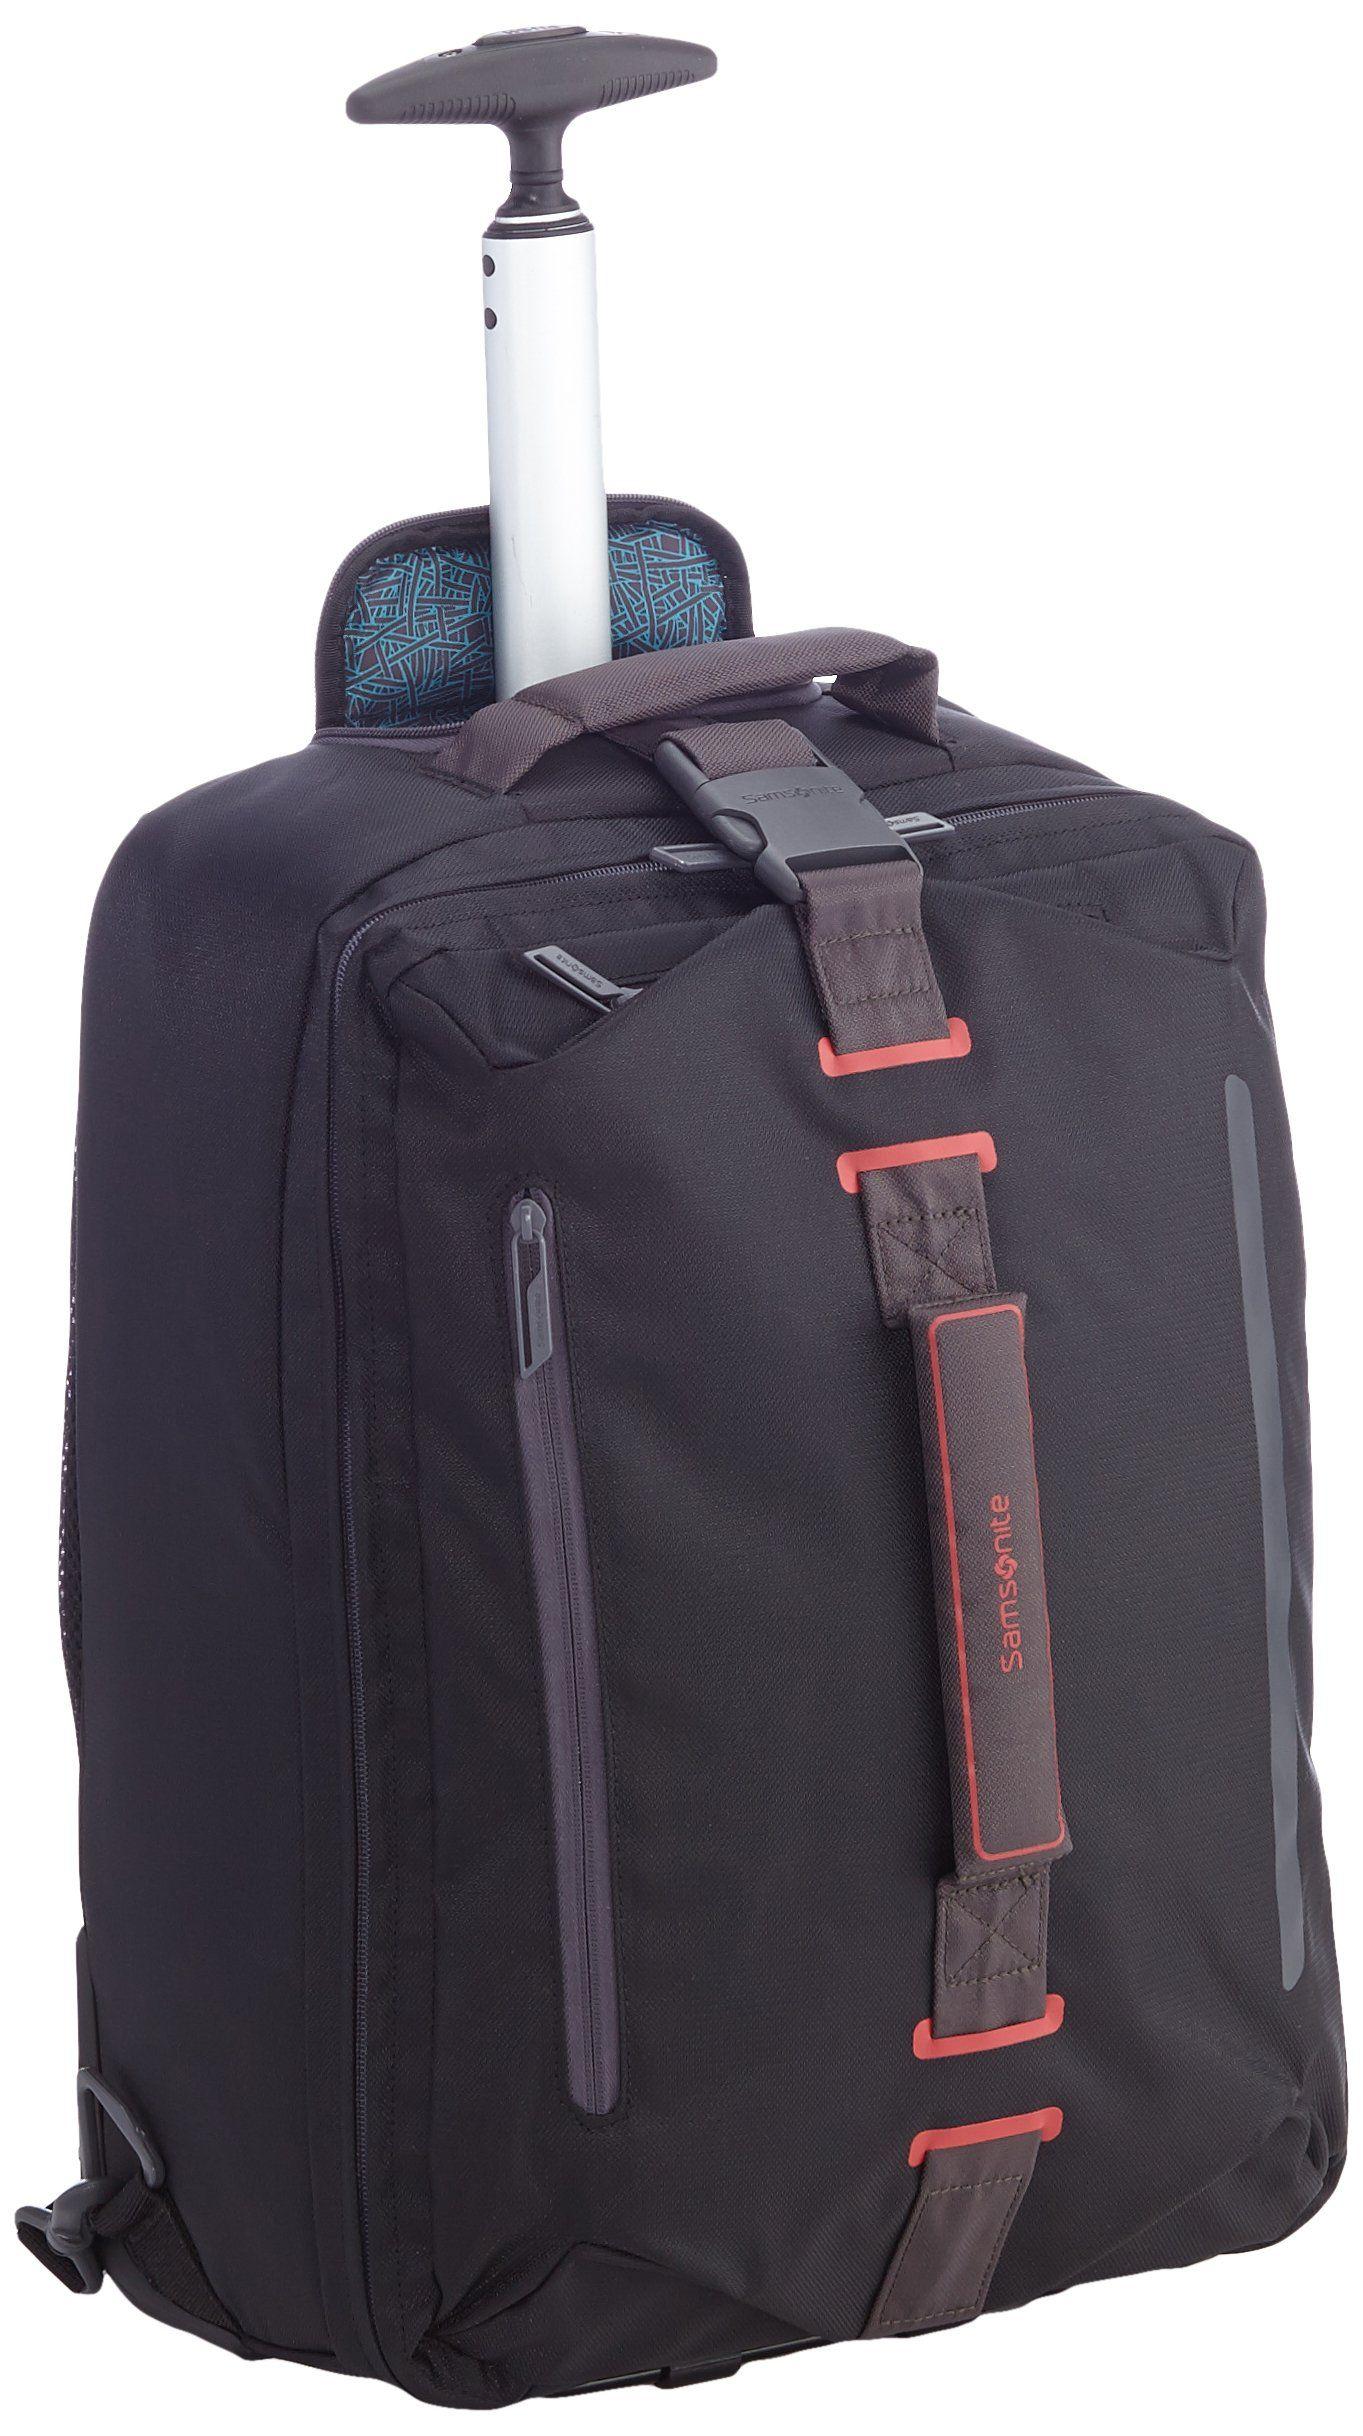 1a82c2833f2 Samsonite Explorall /Wh. Laptop-Rucksack, 50cm, 25 L, Black/Red ...